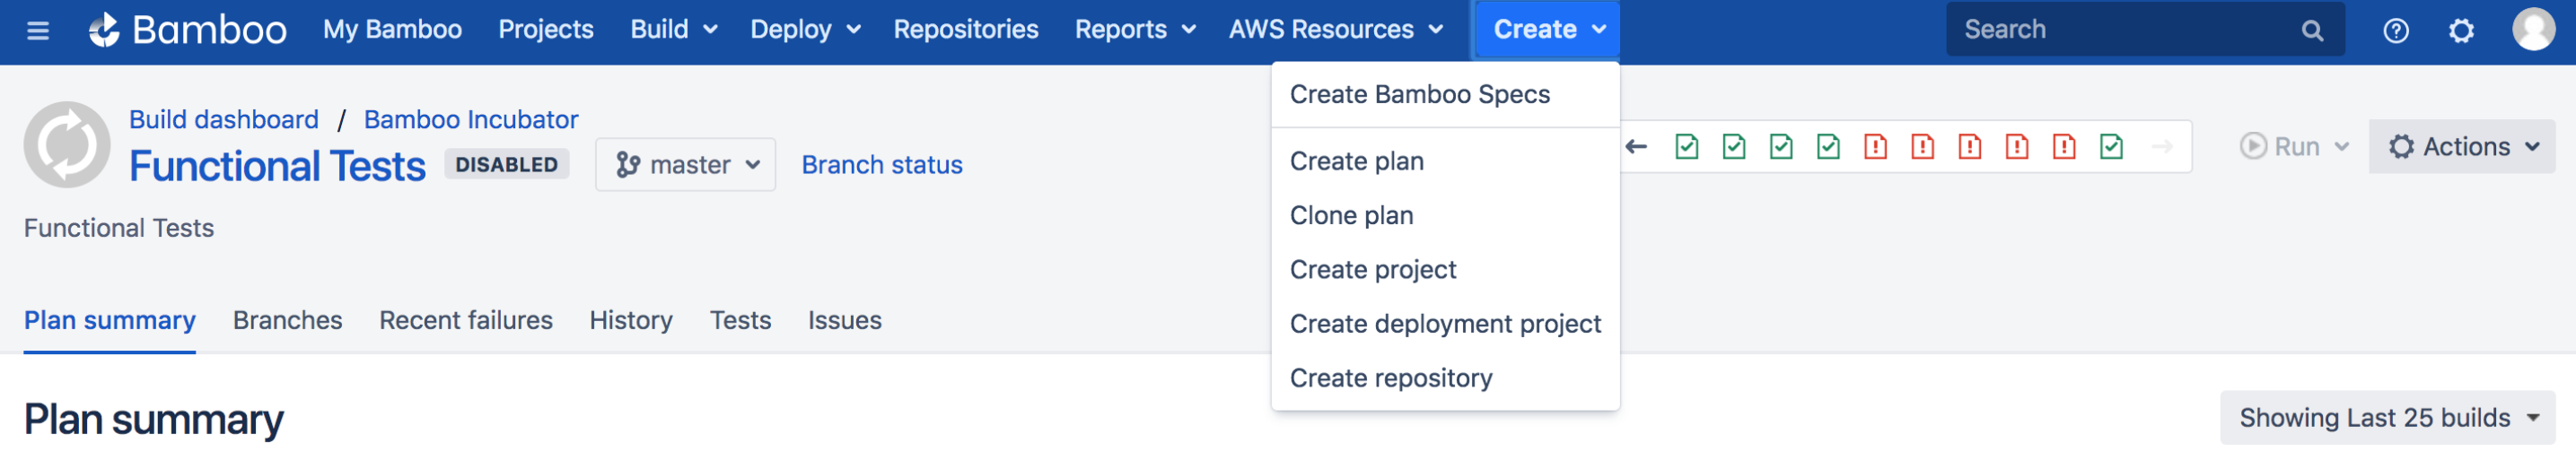 Bamboo 6.8 - neues Design